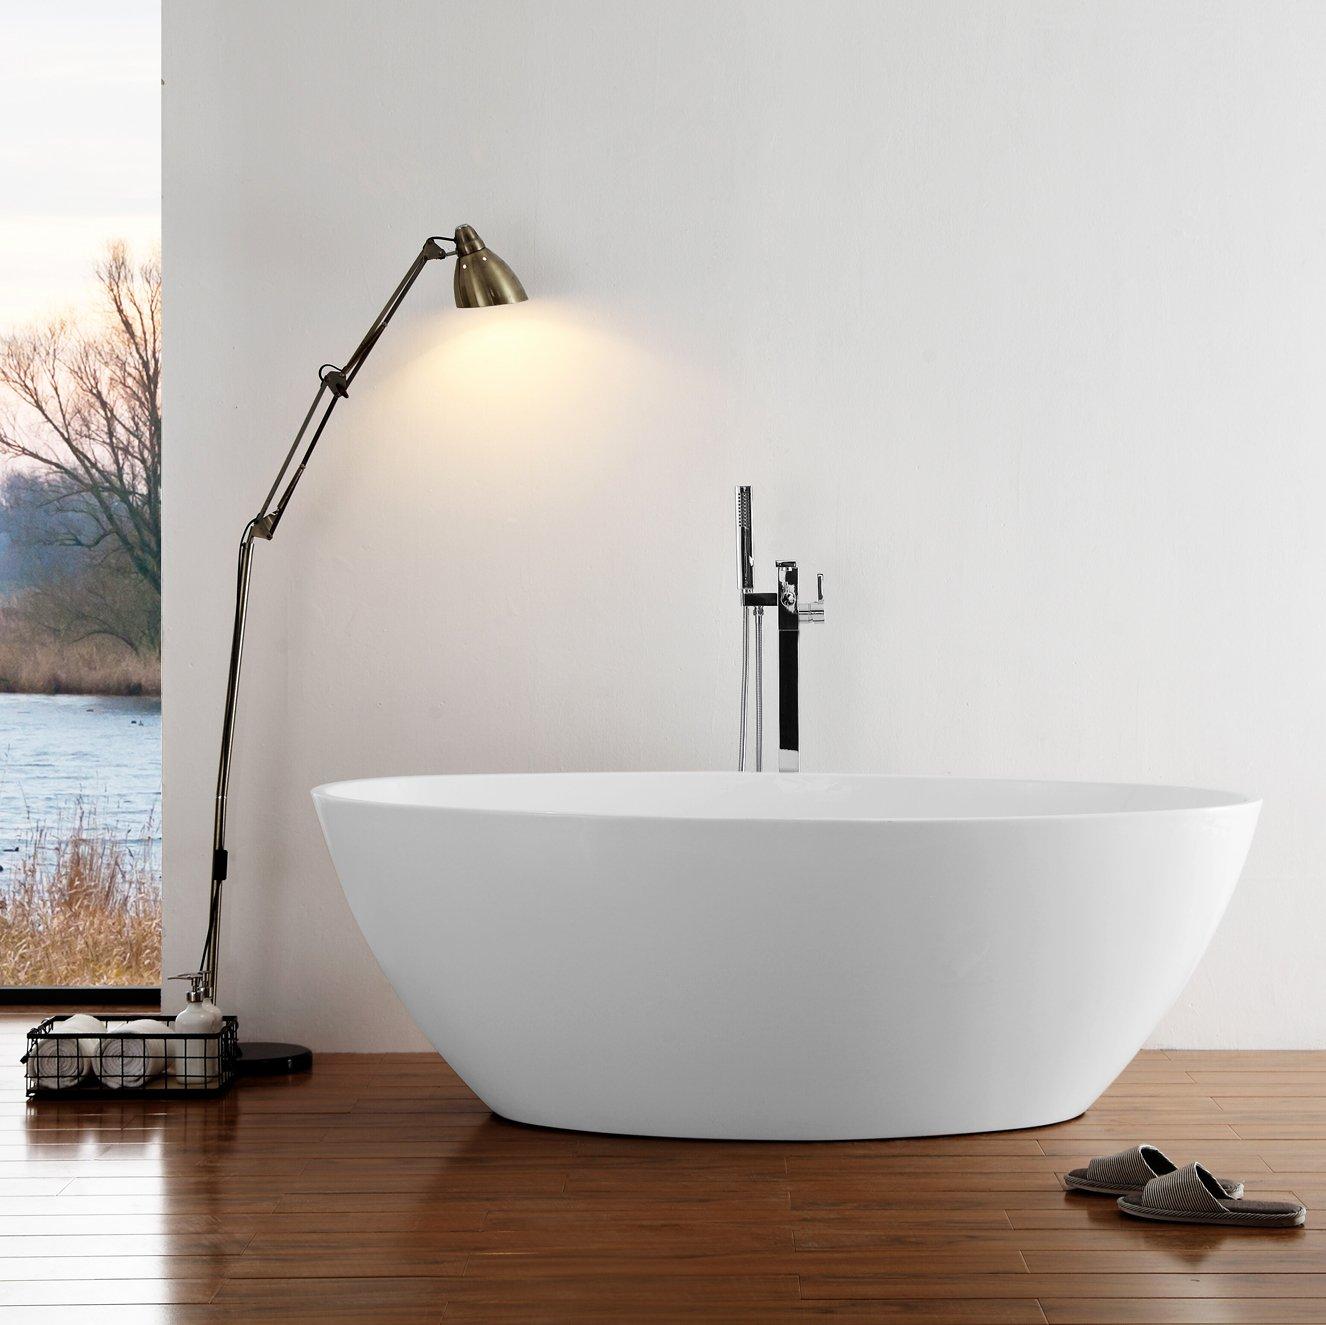 Freistehende Badewanne DESTINO Acryl weiß - 175x100cm - Armatur optional